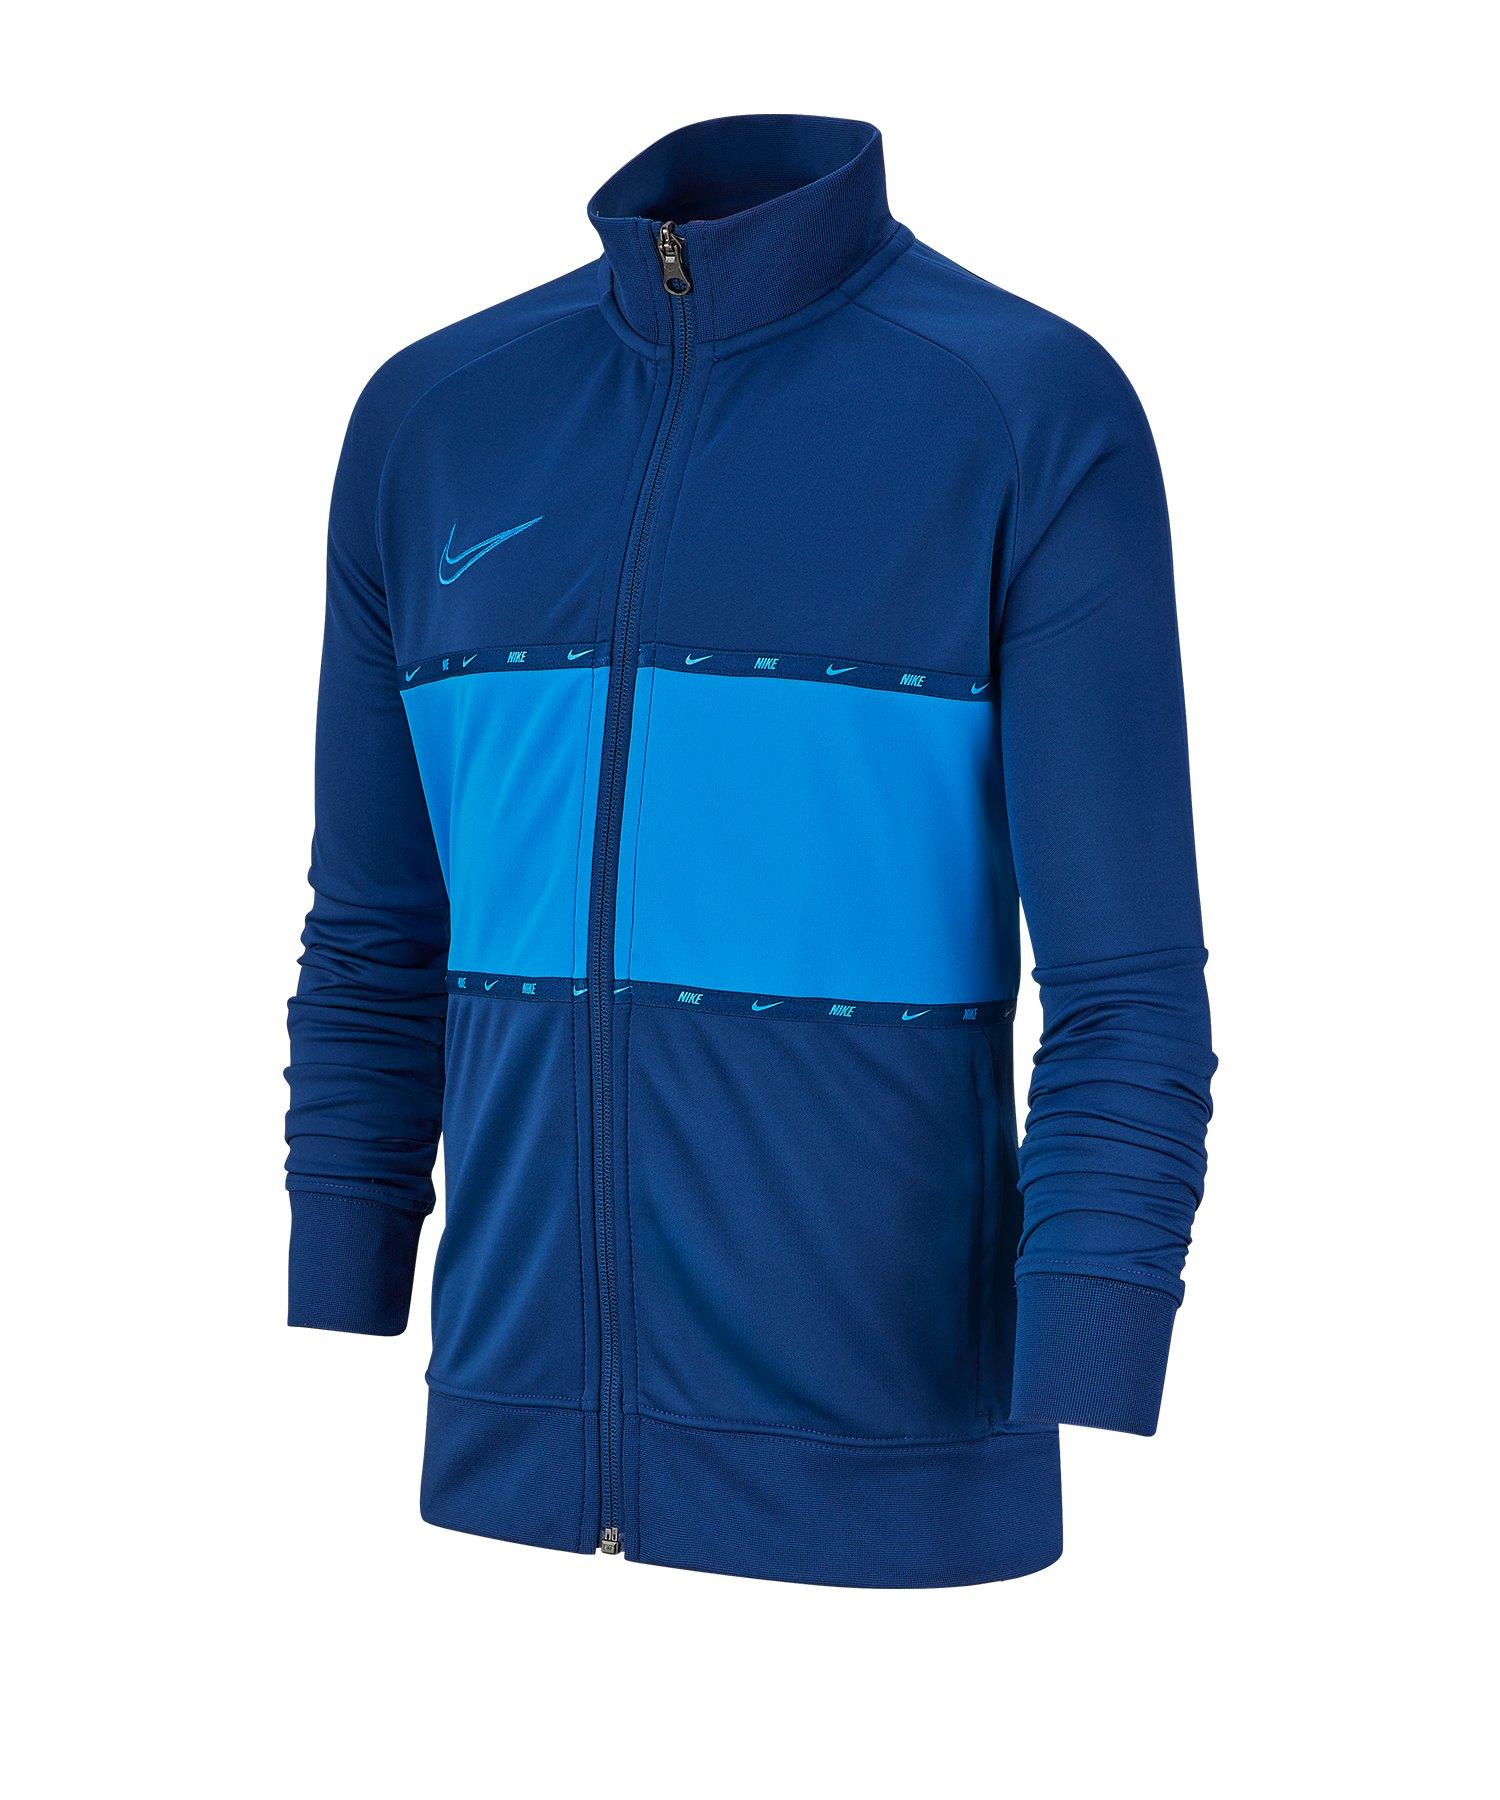 Nike Academy Dri-FIT Trainingsjacke Kids Blau F407 - blau